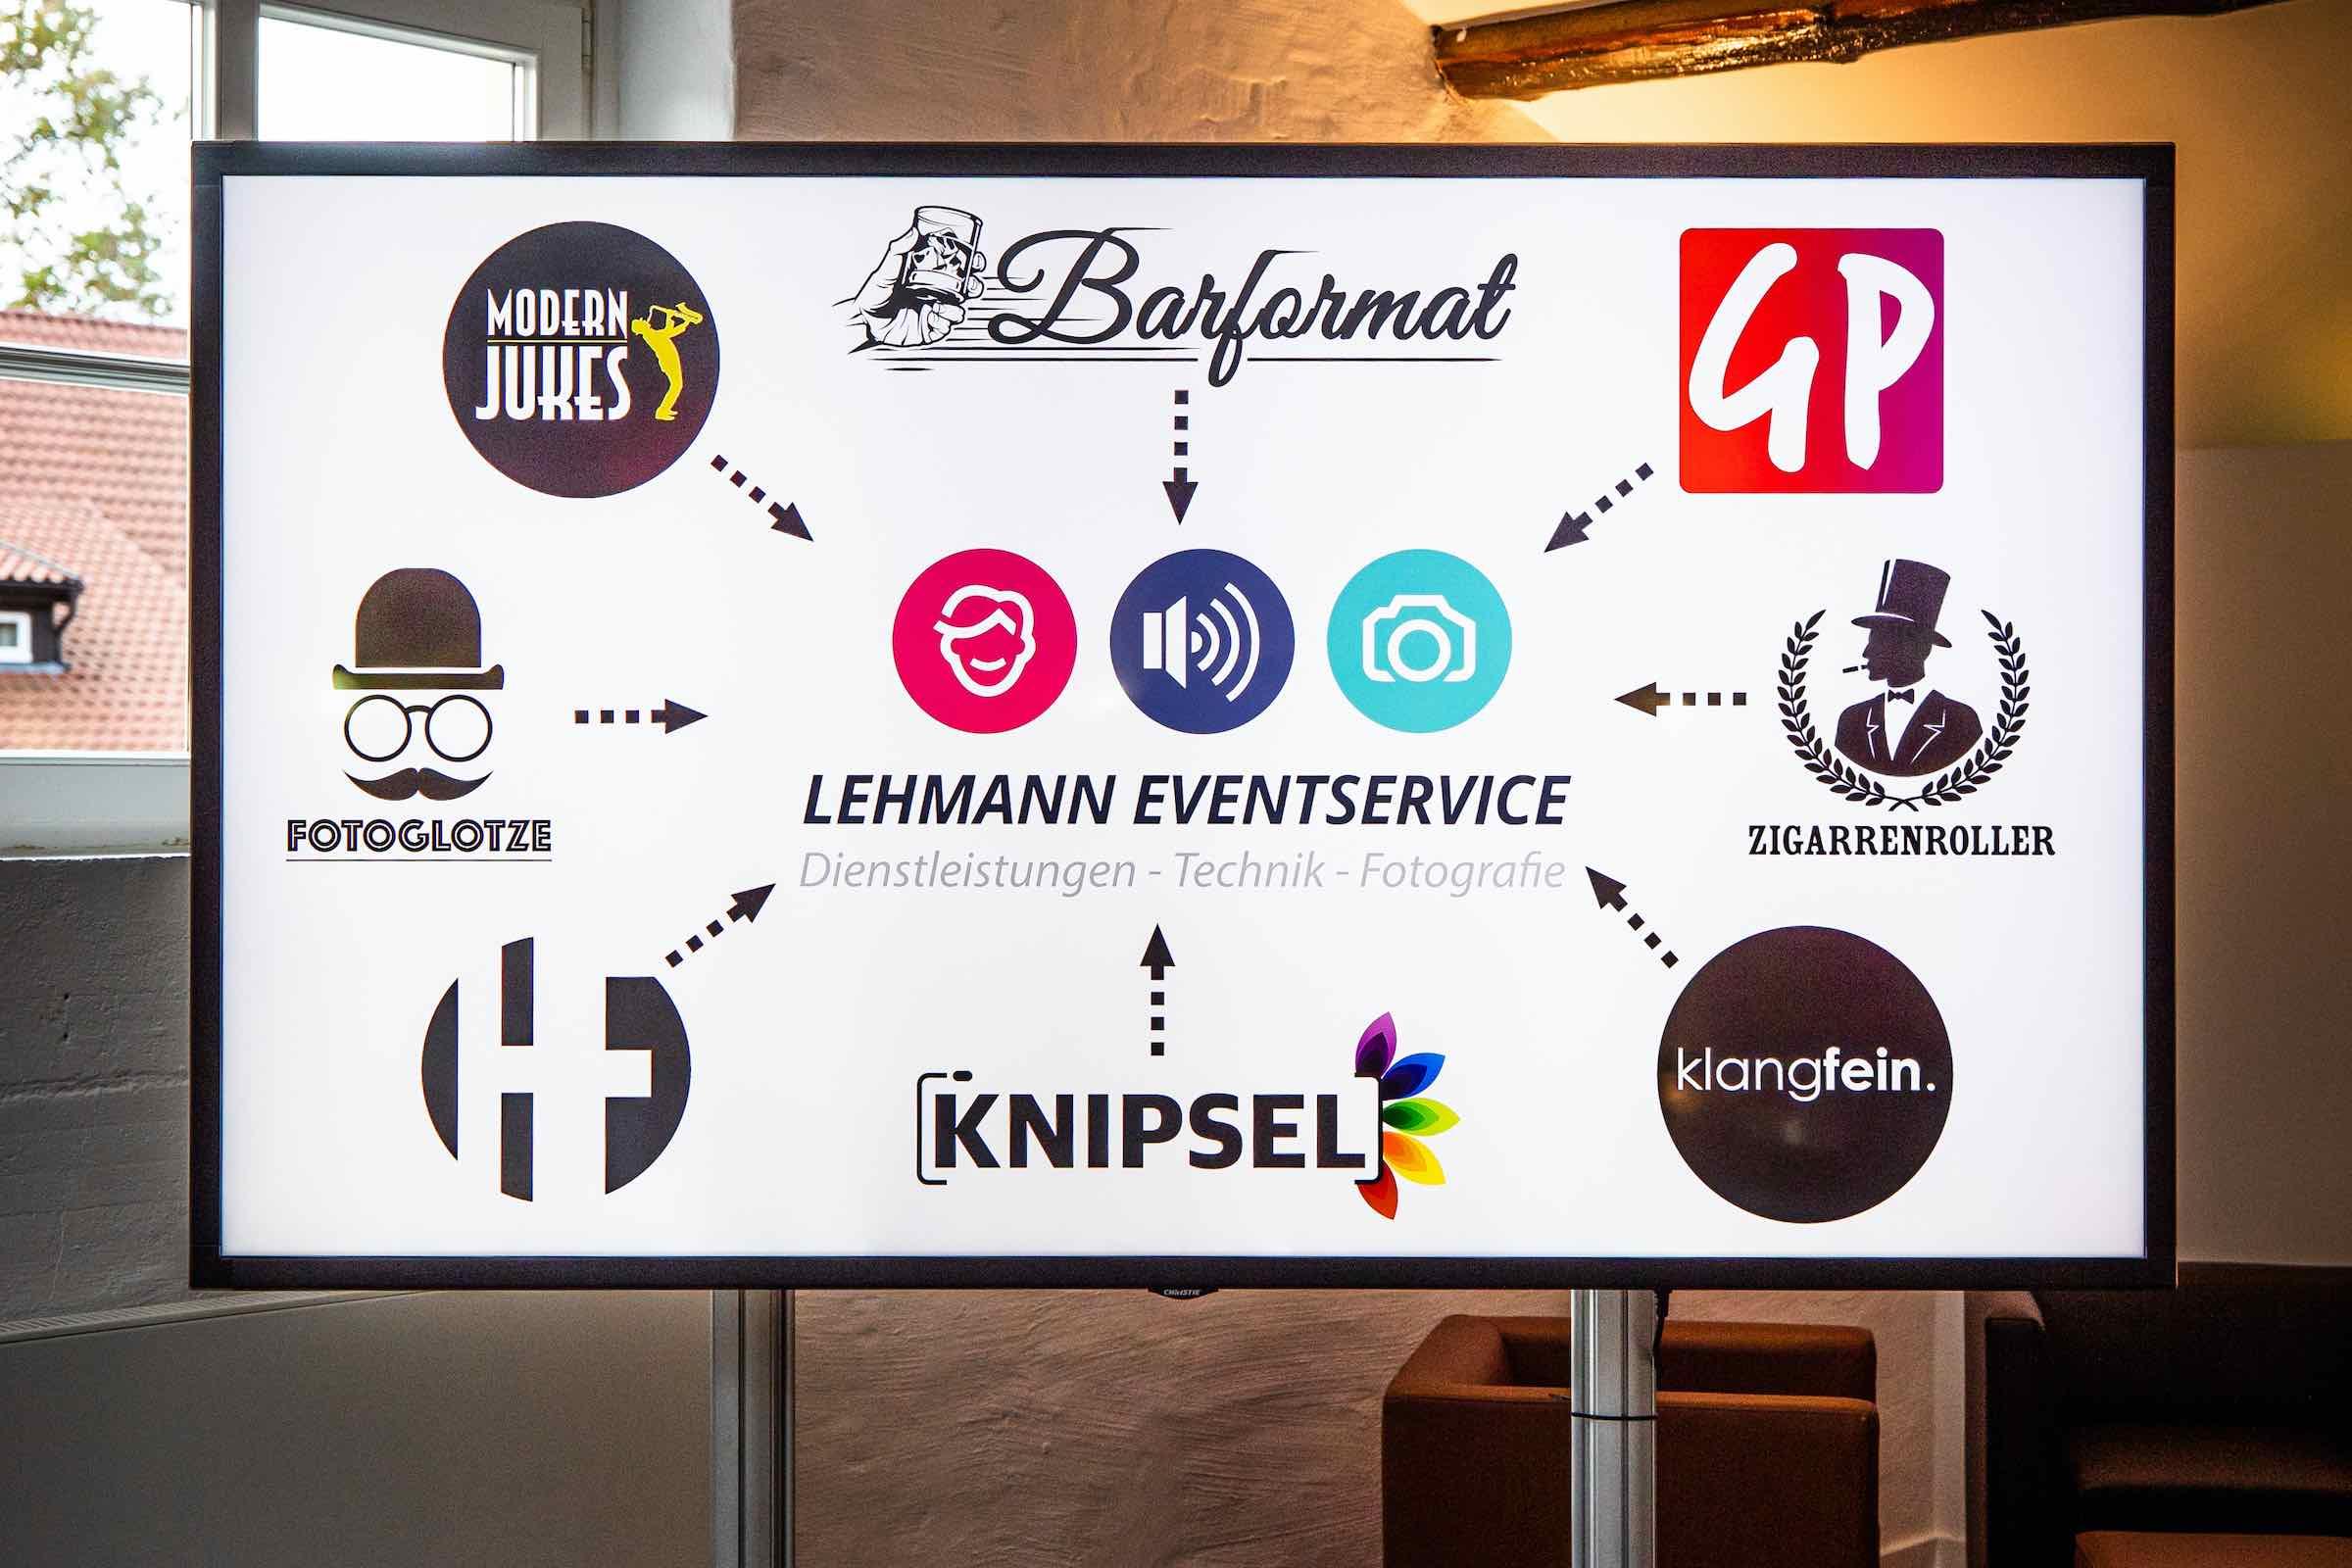 Medientechnik |LCD |Panel |Fernseher |LED |Mieten |Hannover |Tagung |Messe |Business |Event |Mieten |Leihen |ProjektionLehmann |Eventservice